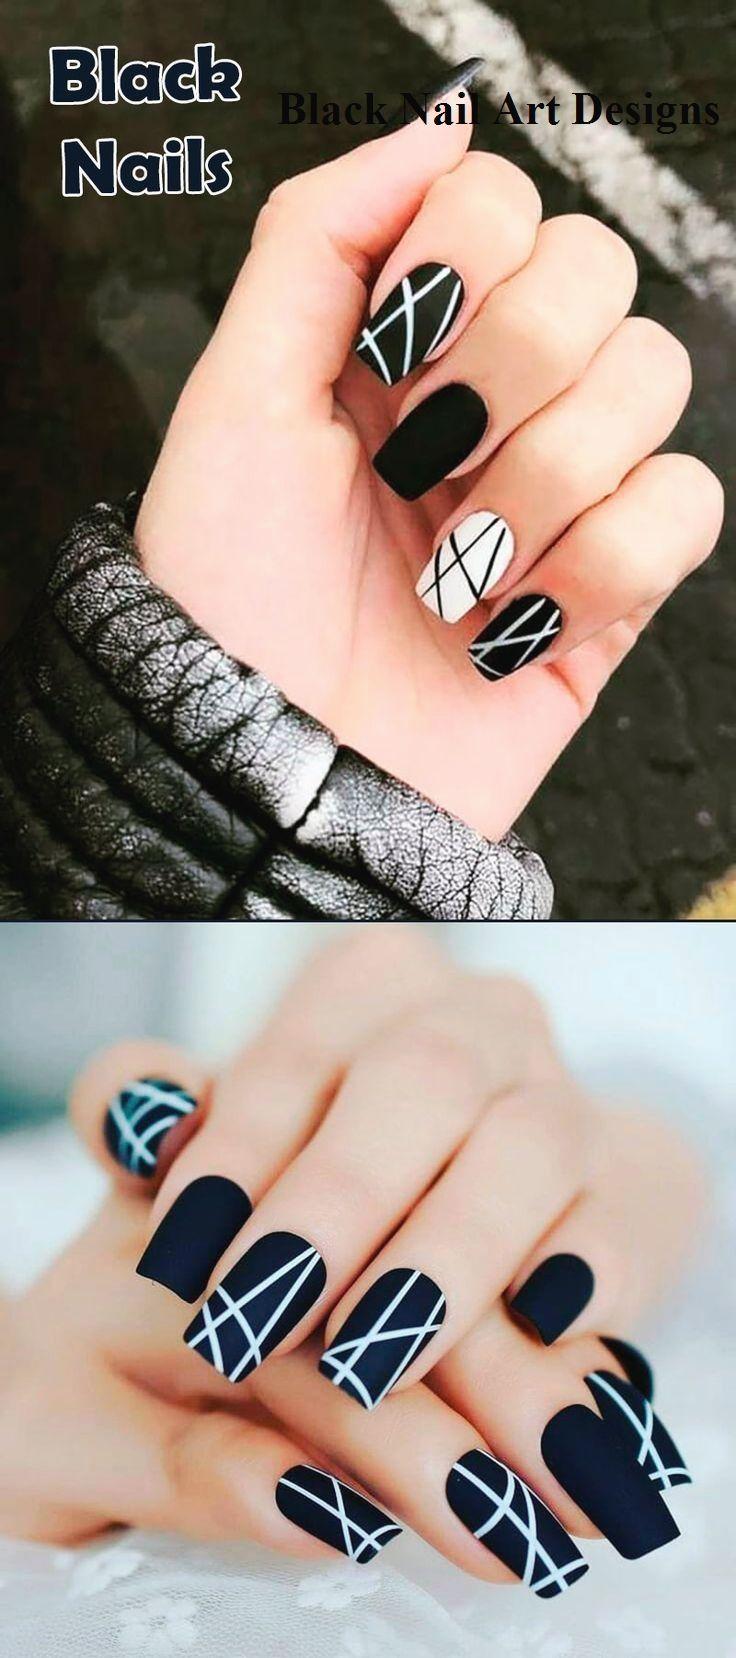 99 Trending Black Nails Art Manikure Ideen Schwarze Sargnagel Schwarzes Acryl Unghie Beige Unghie Unghie Idee